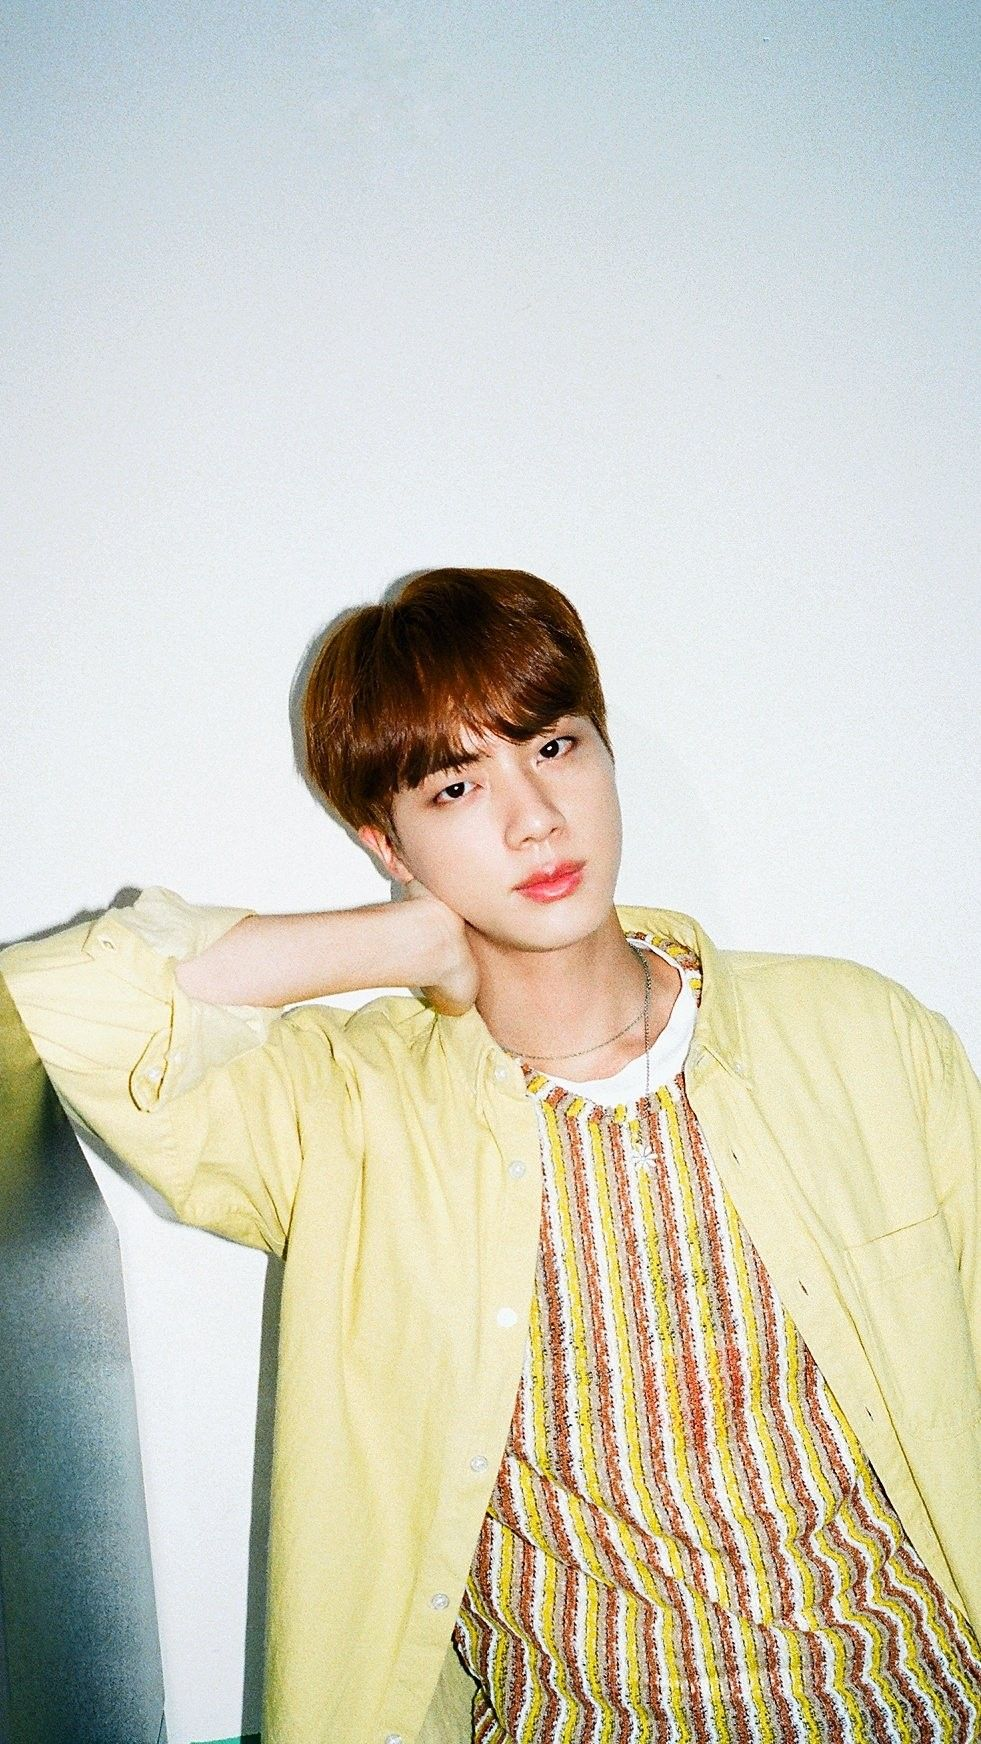 Bts Army Jin Worldwidehandsome Kimseokjin Dynamite Teaserphoto Btscomeback Di 2020 Gadis Korea Gambar Orang Lucu